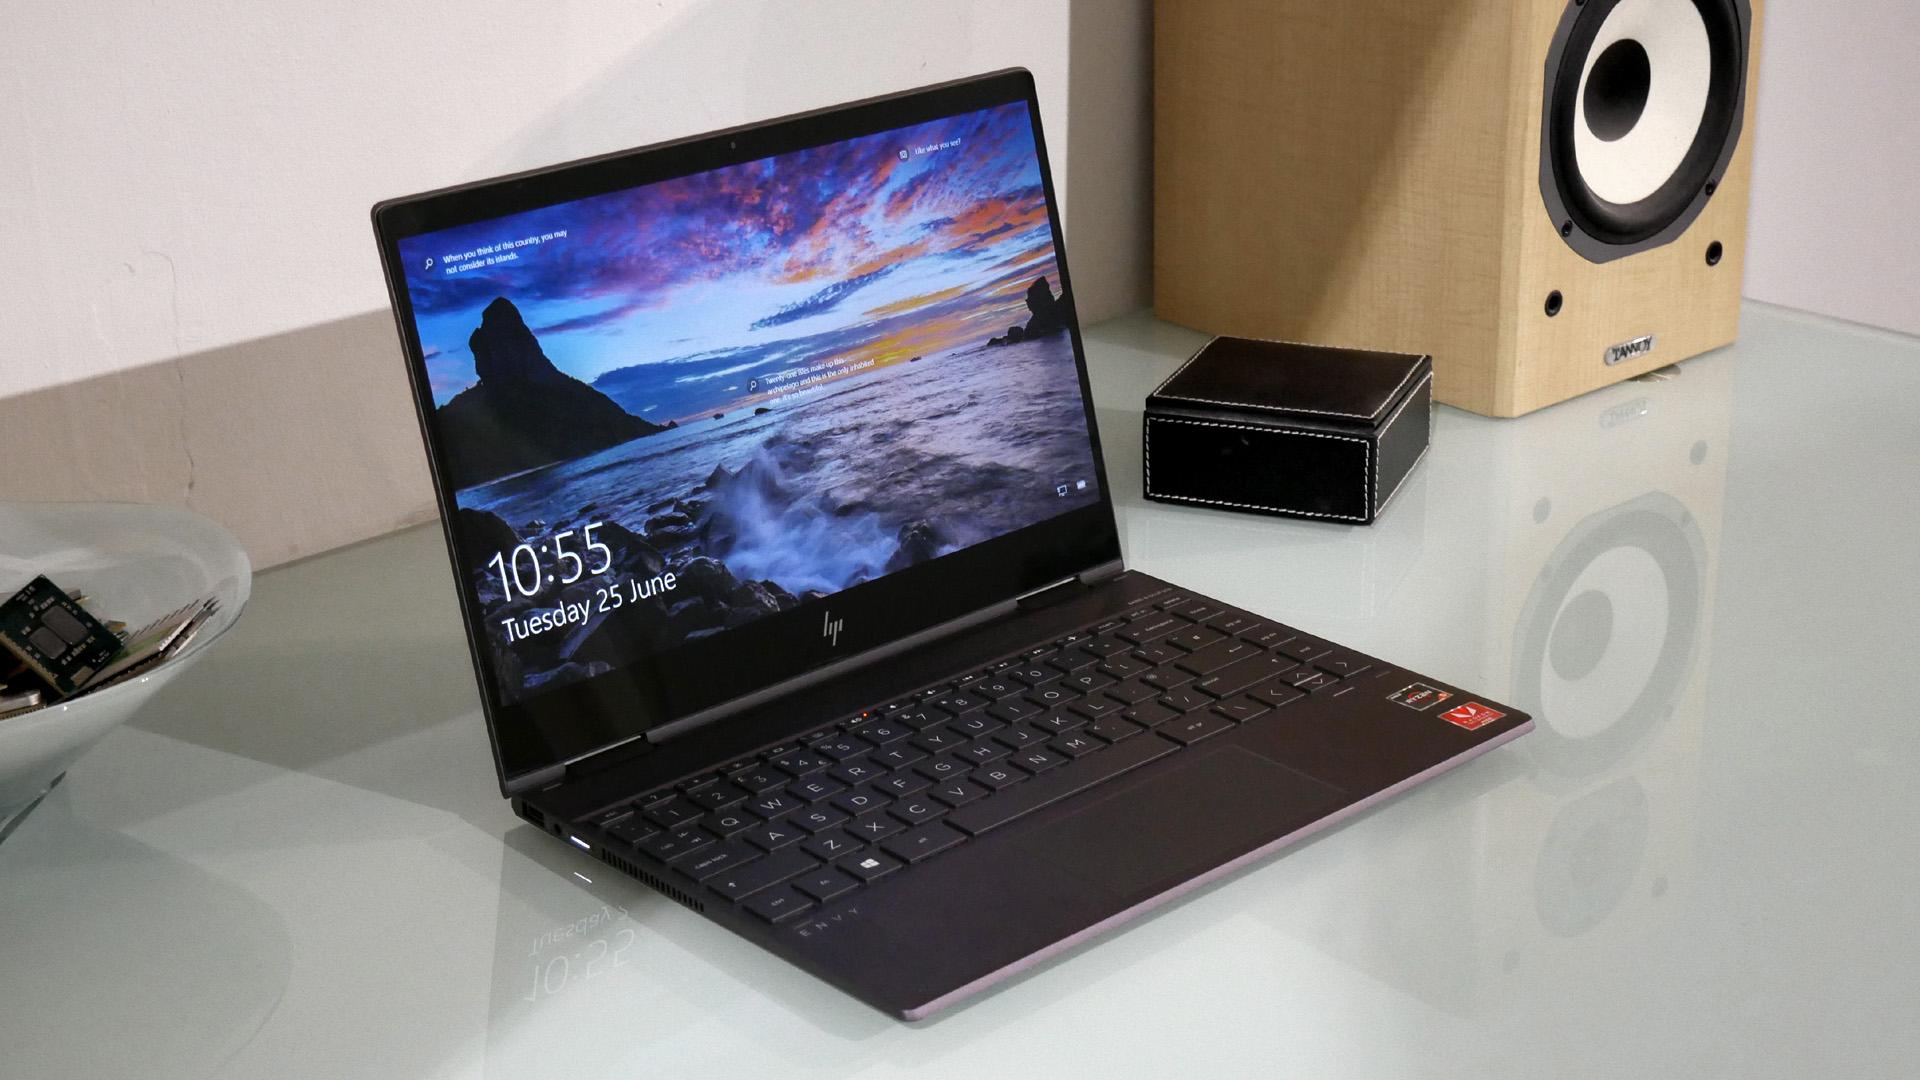 HP Envy x360 13 (2019)